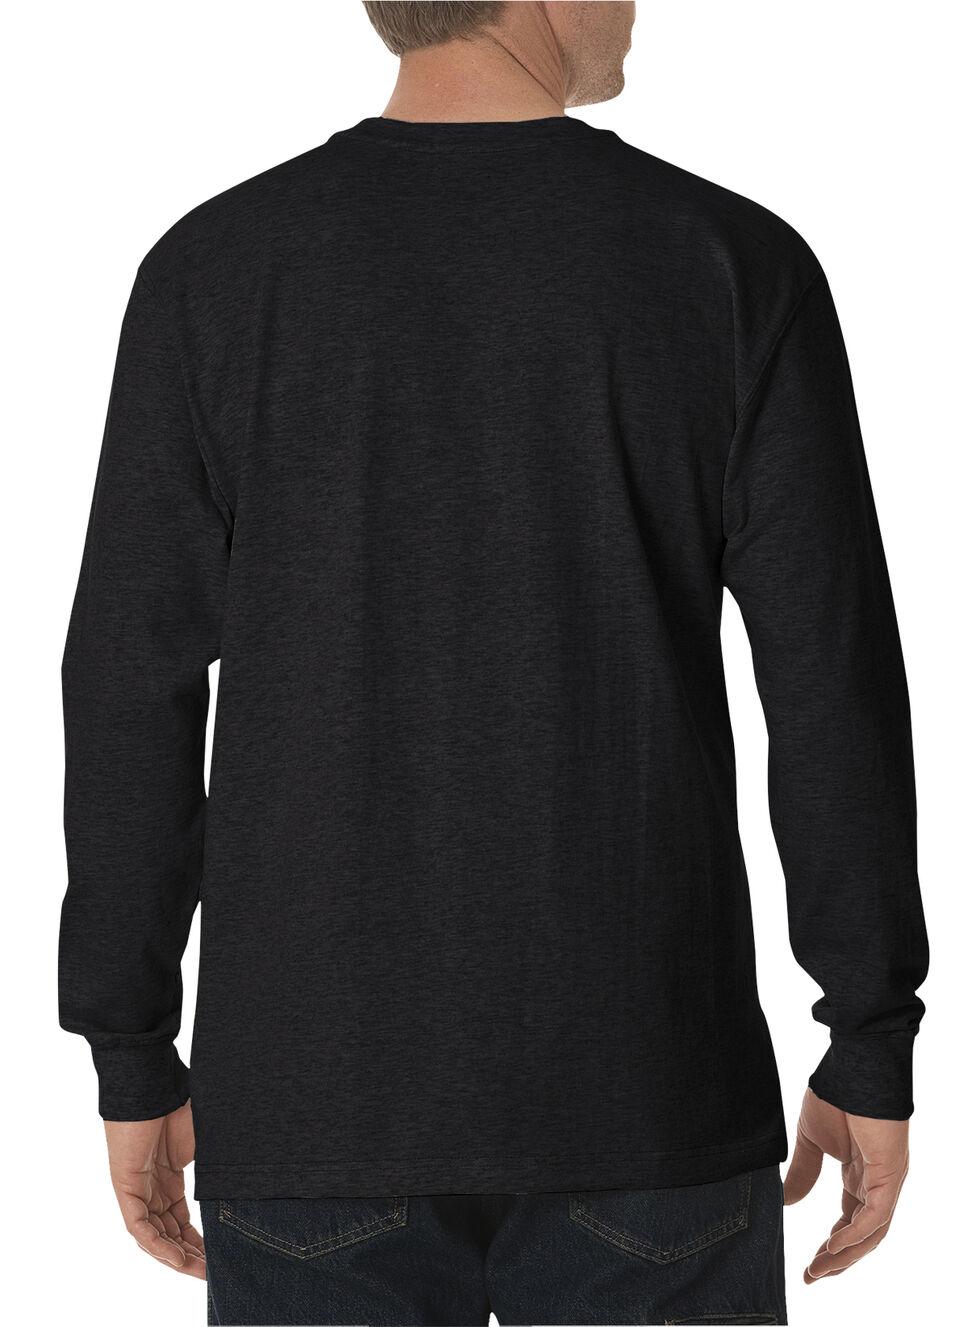 Dickies Men's Heavy Weight Crew Long Sleeve Tee - Big & Tall, Black, hi-res